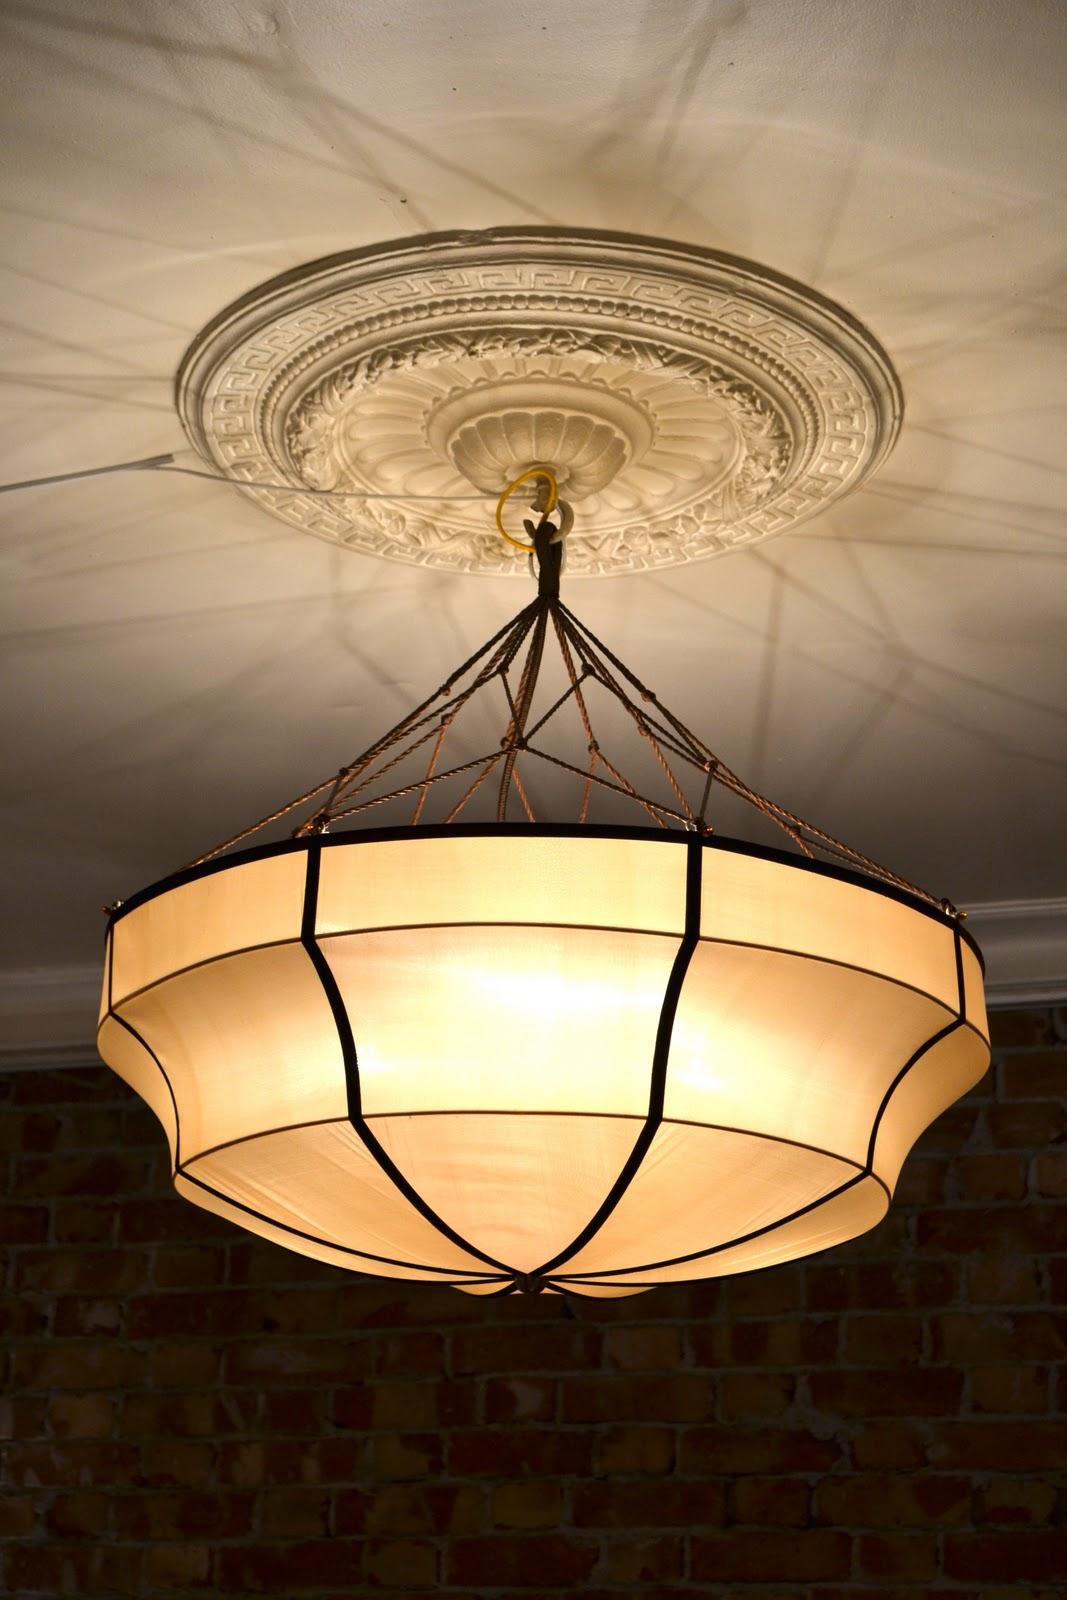 Tree Lampe: KEISERENS NYE TRaeR: NUD vs Clas Ohlson. Barnelamper ...